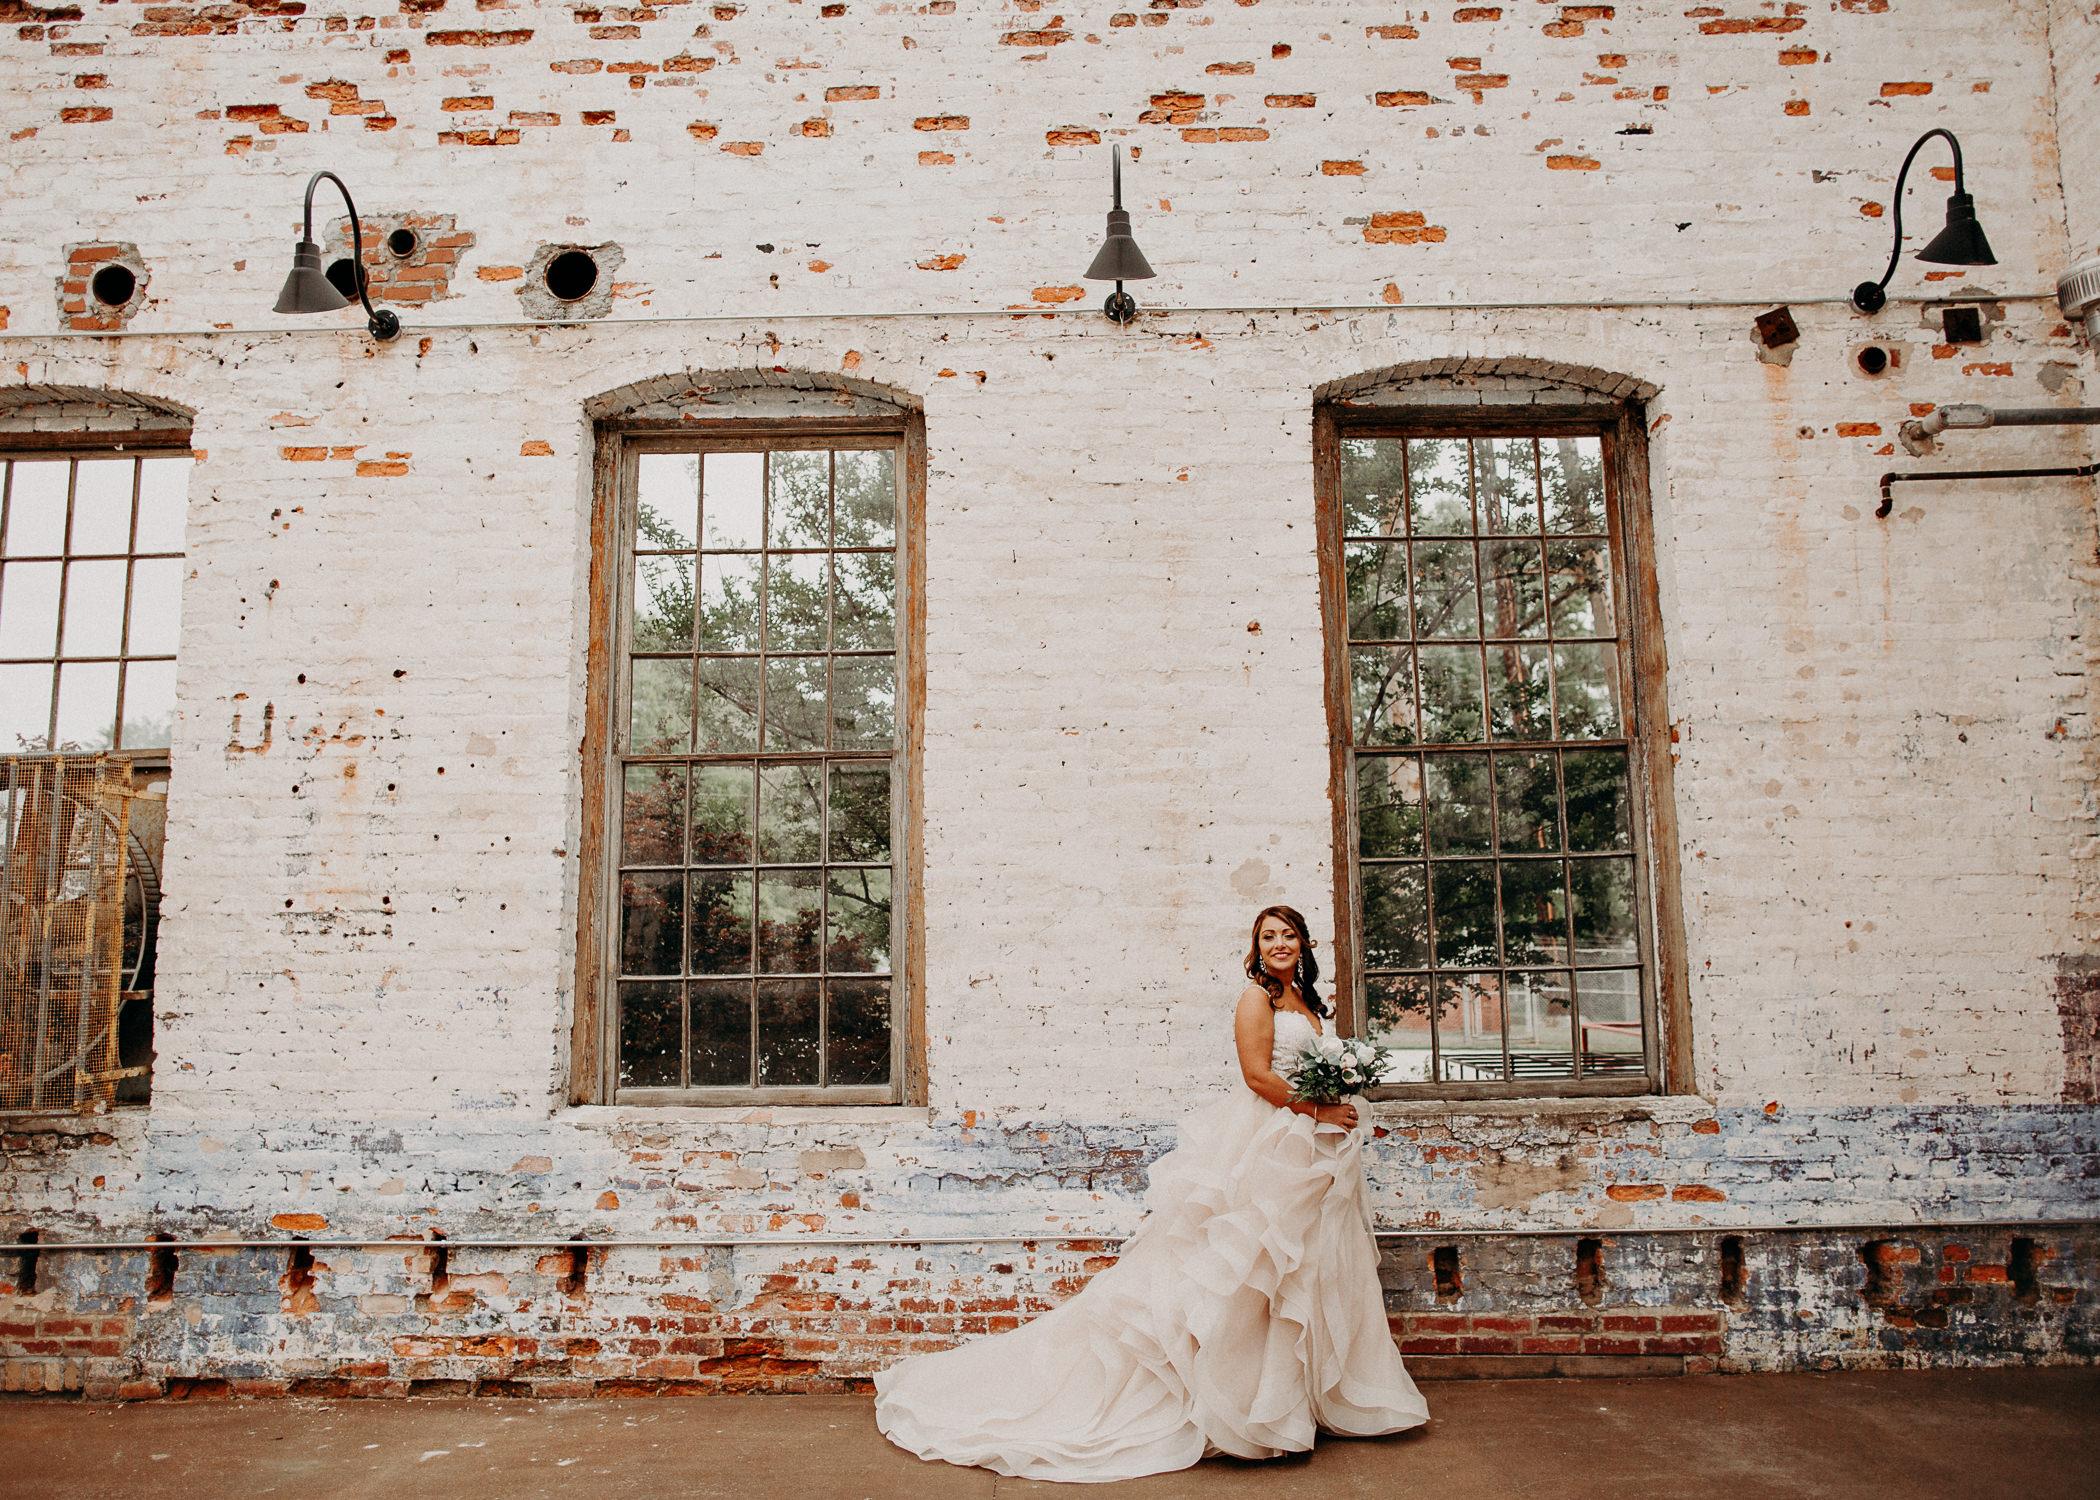 21 4 - Atlanta Wedding Photographer - The engine room - Ga - Wedding trends - Aline Marin Photography.jpg